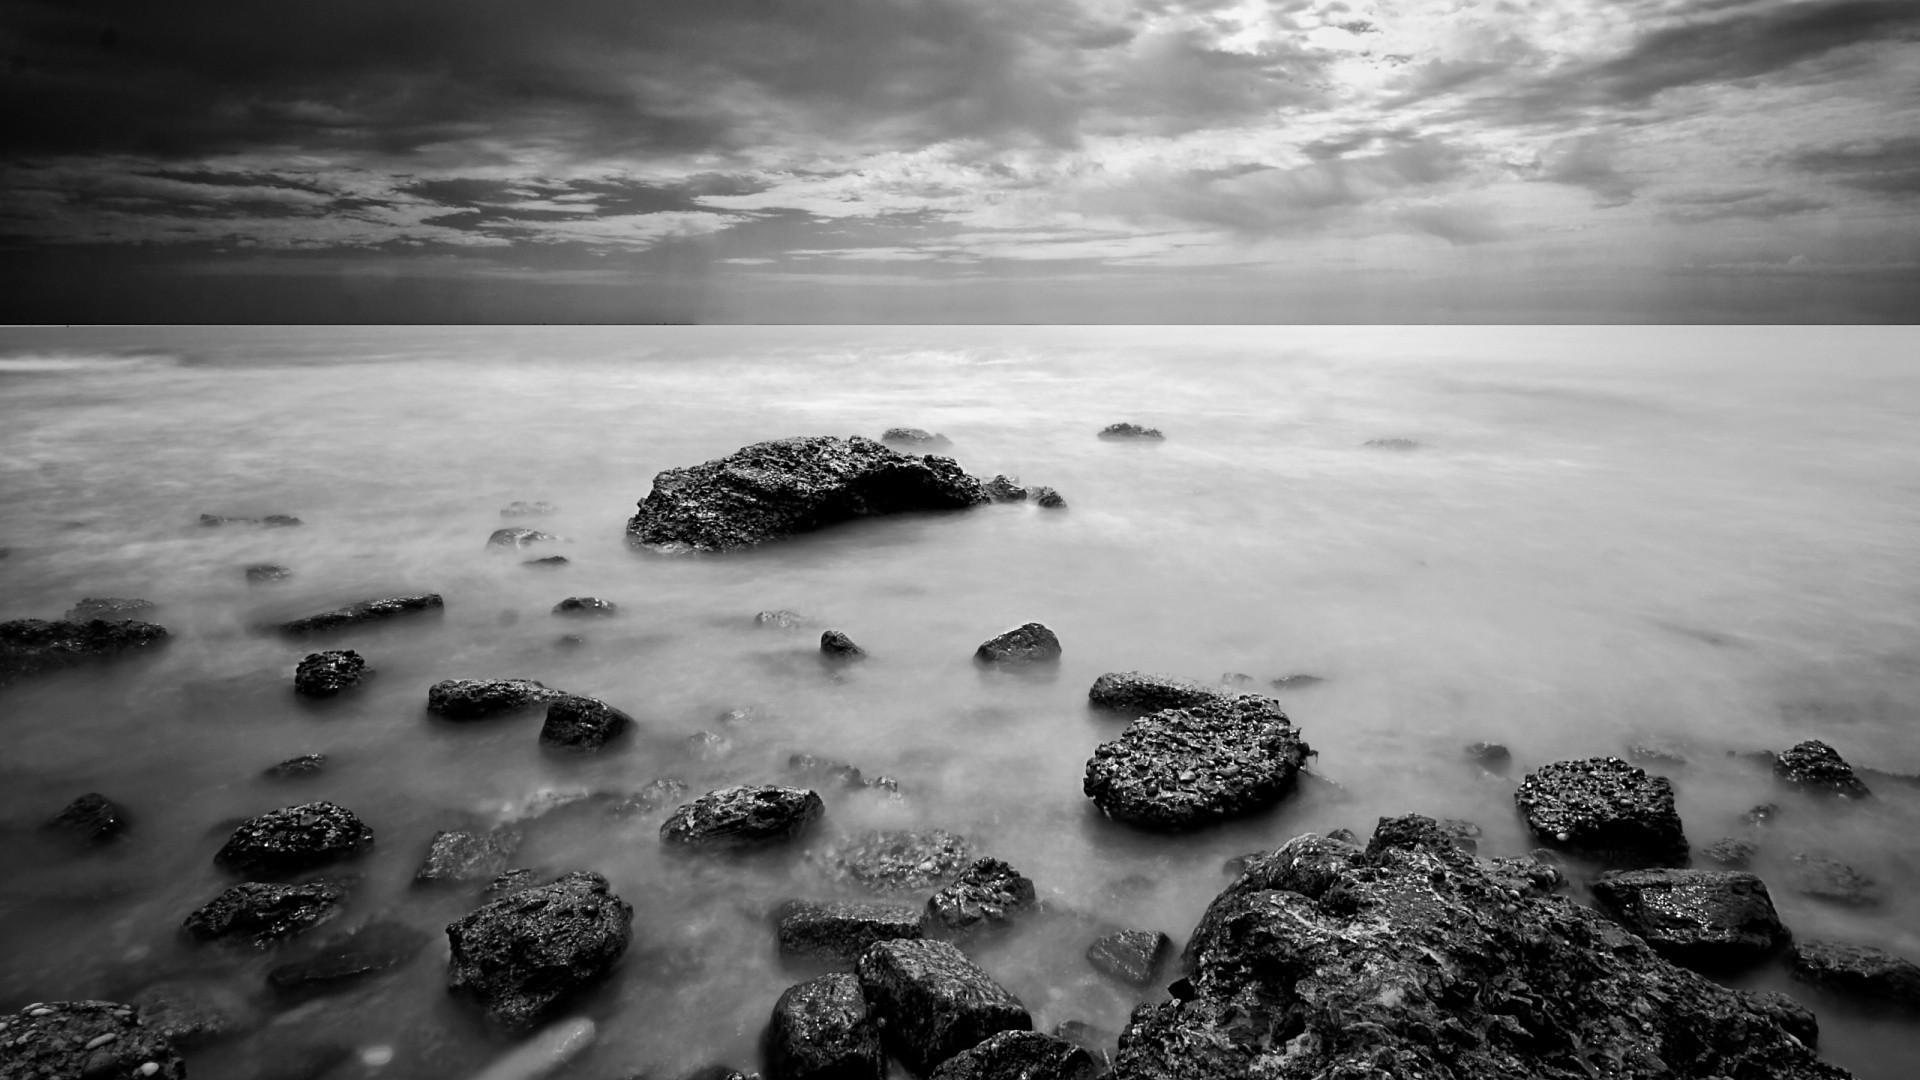 Black and white landscapes nature monochrome sea wallpaper      183687   WallpaperUP